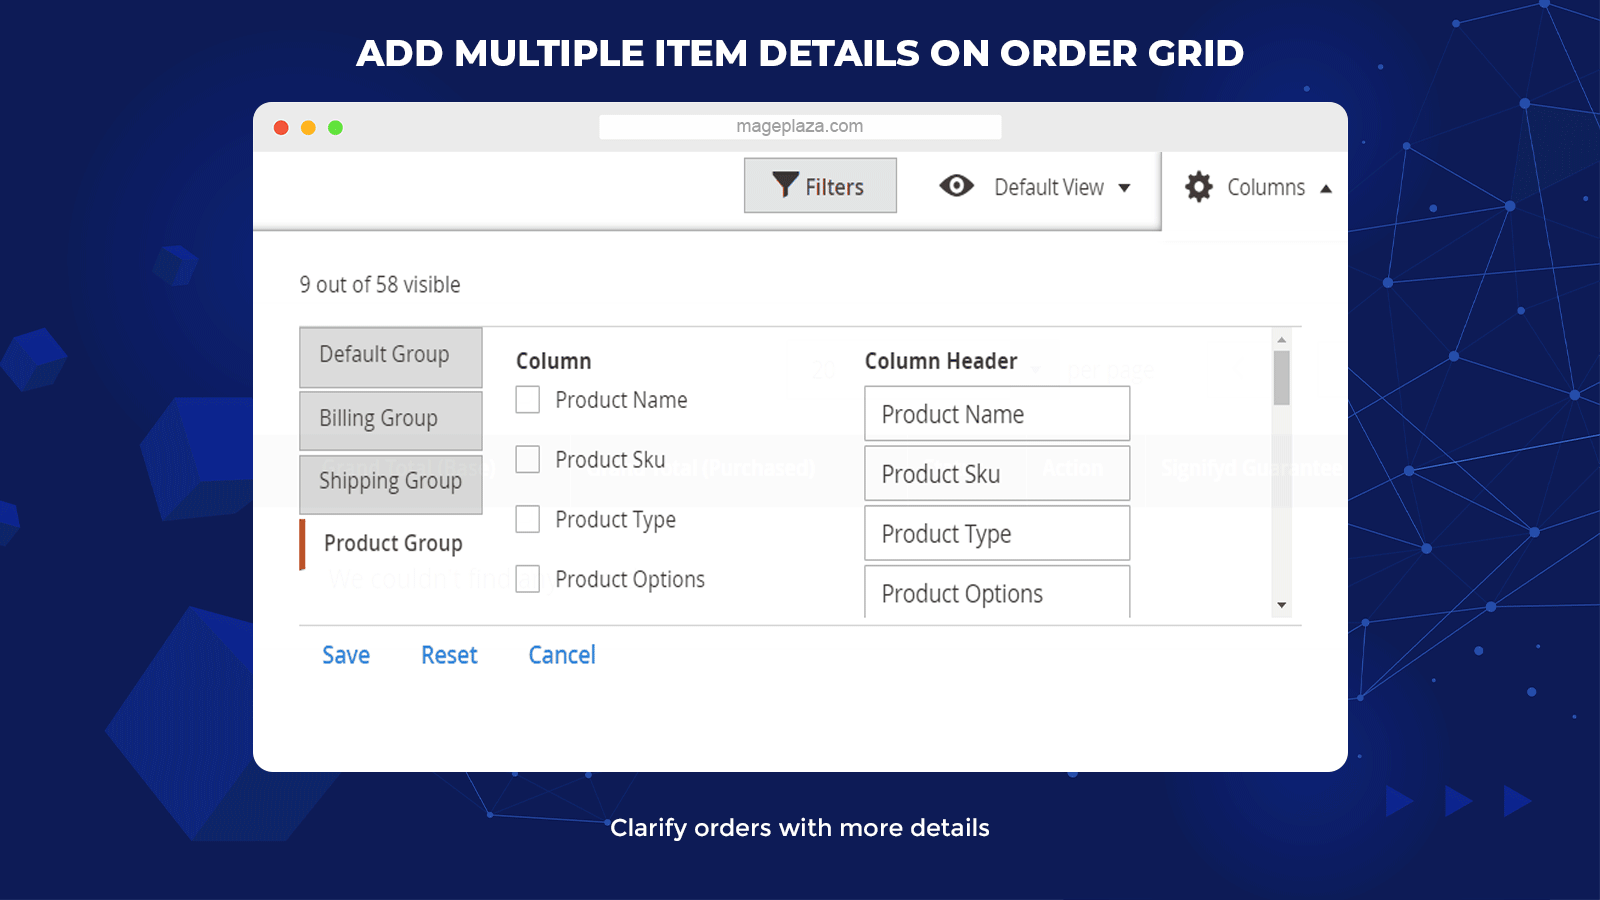 magento 2 order grid extension